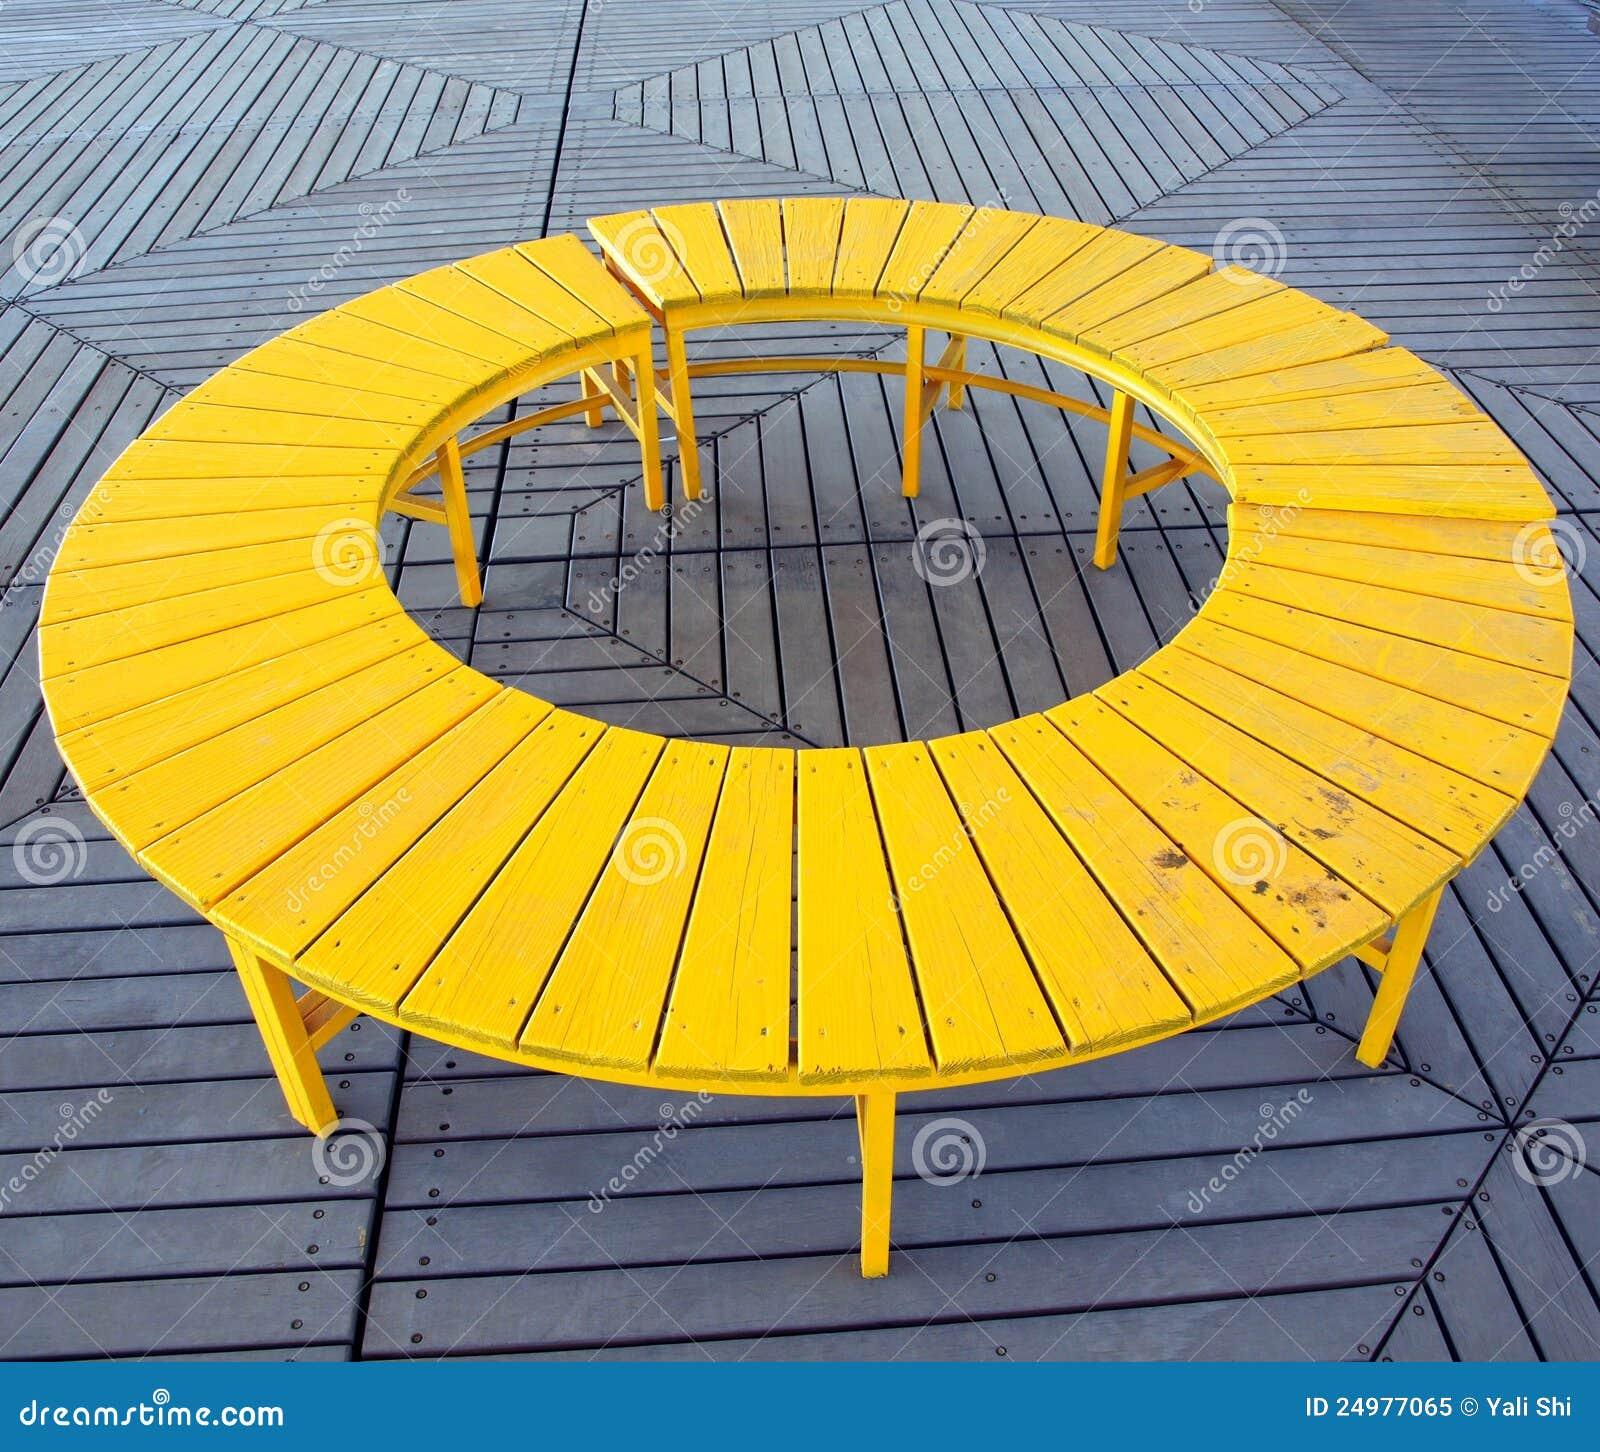 banc circulaire jaune image stock image du perspective 24977065. Black Bedroom Furniture Sets. Home Design Ideas